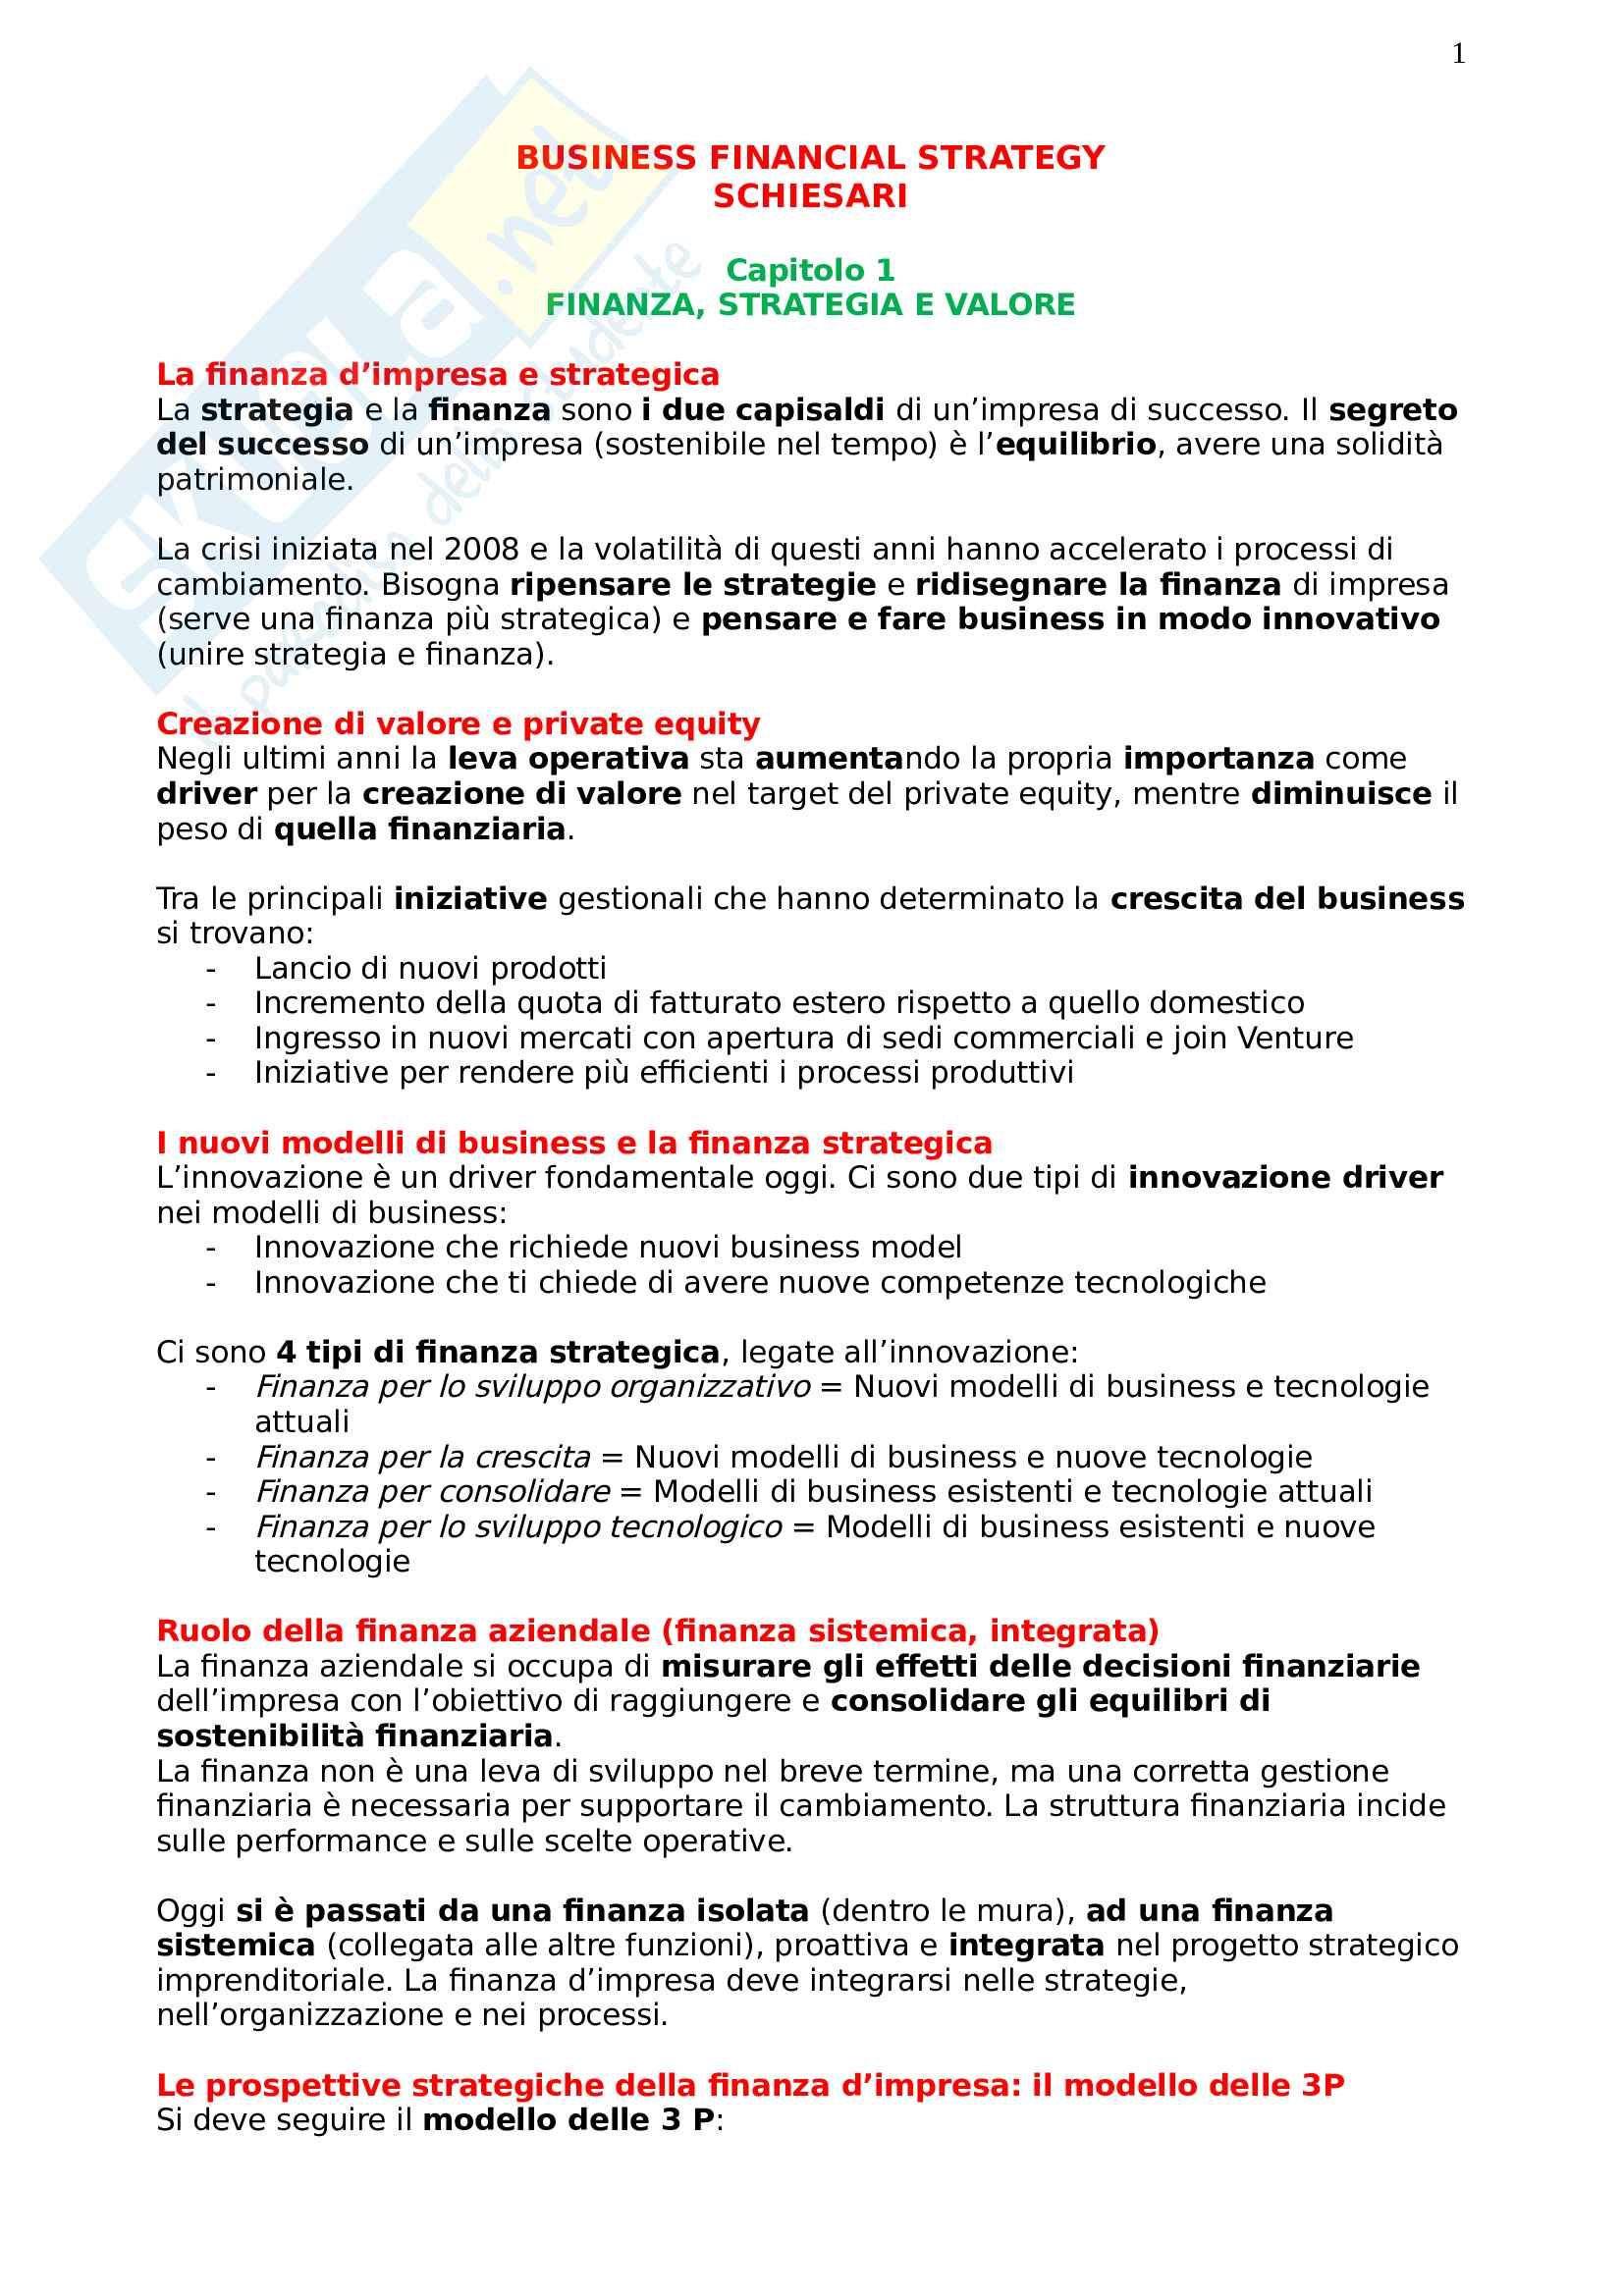 Risposte Business Financial Strategy, prof Schiesari